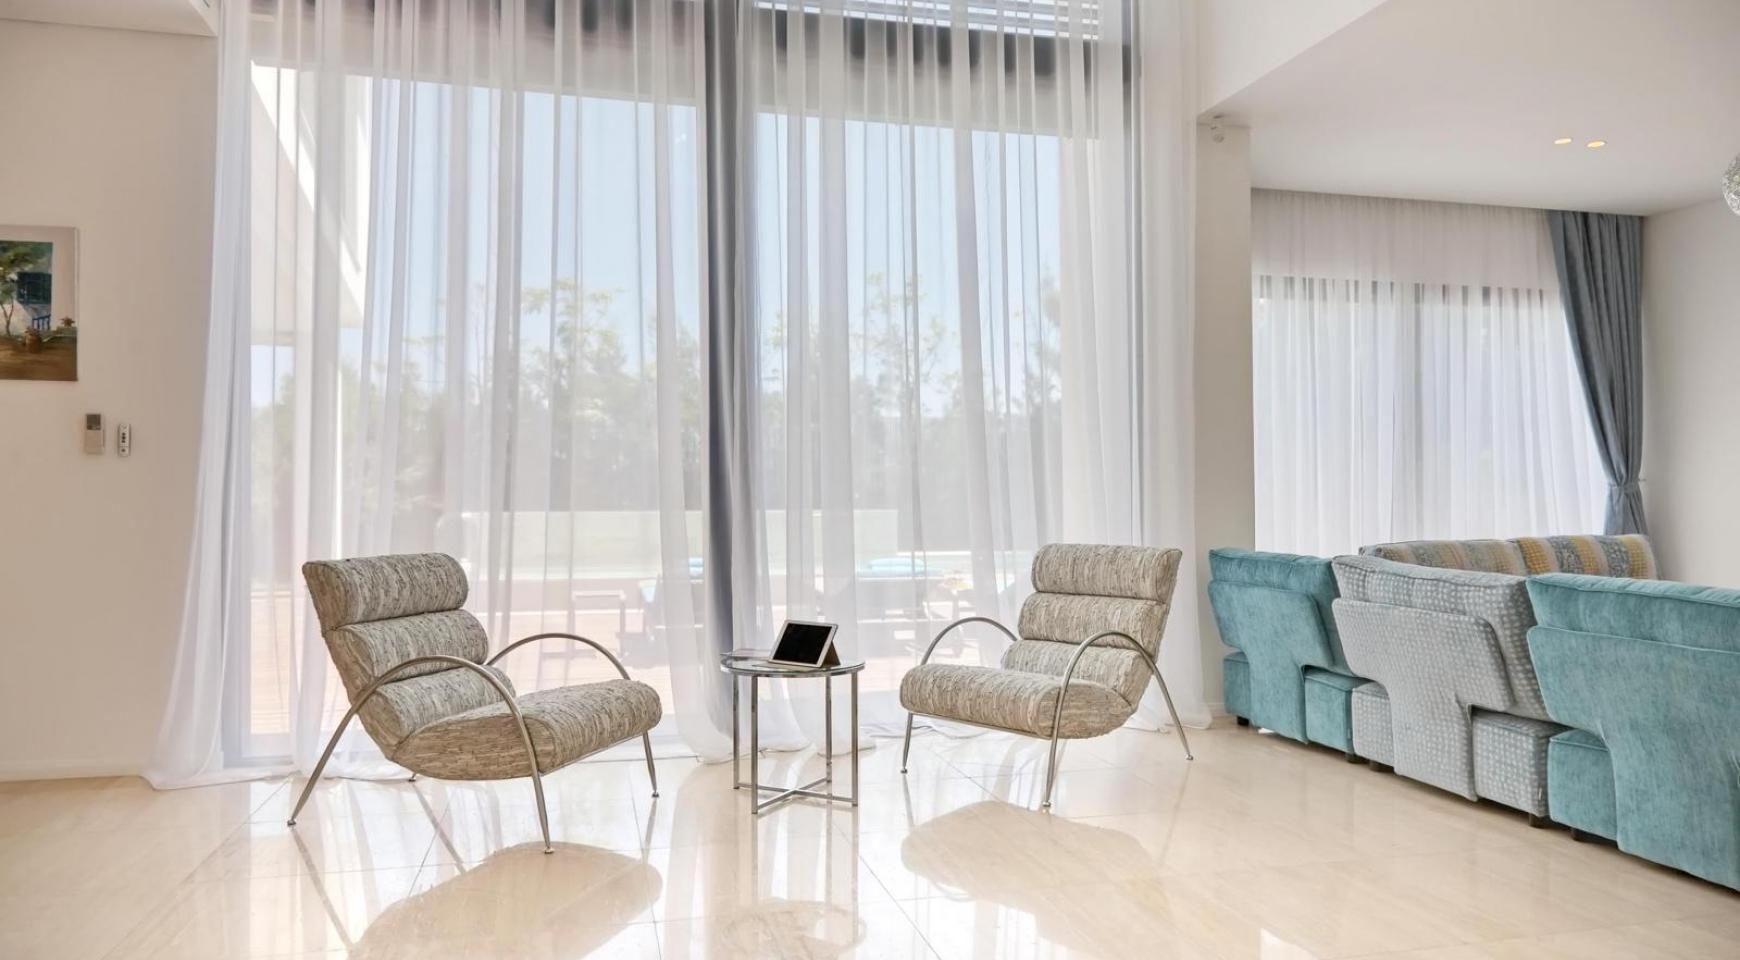 New Luxurious 4 Bedroom Villa in the Tourist Area - 26